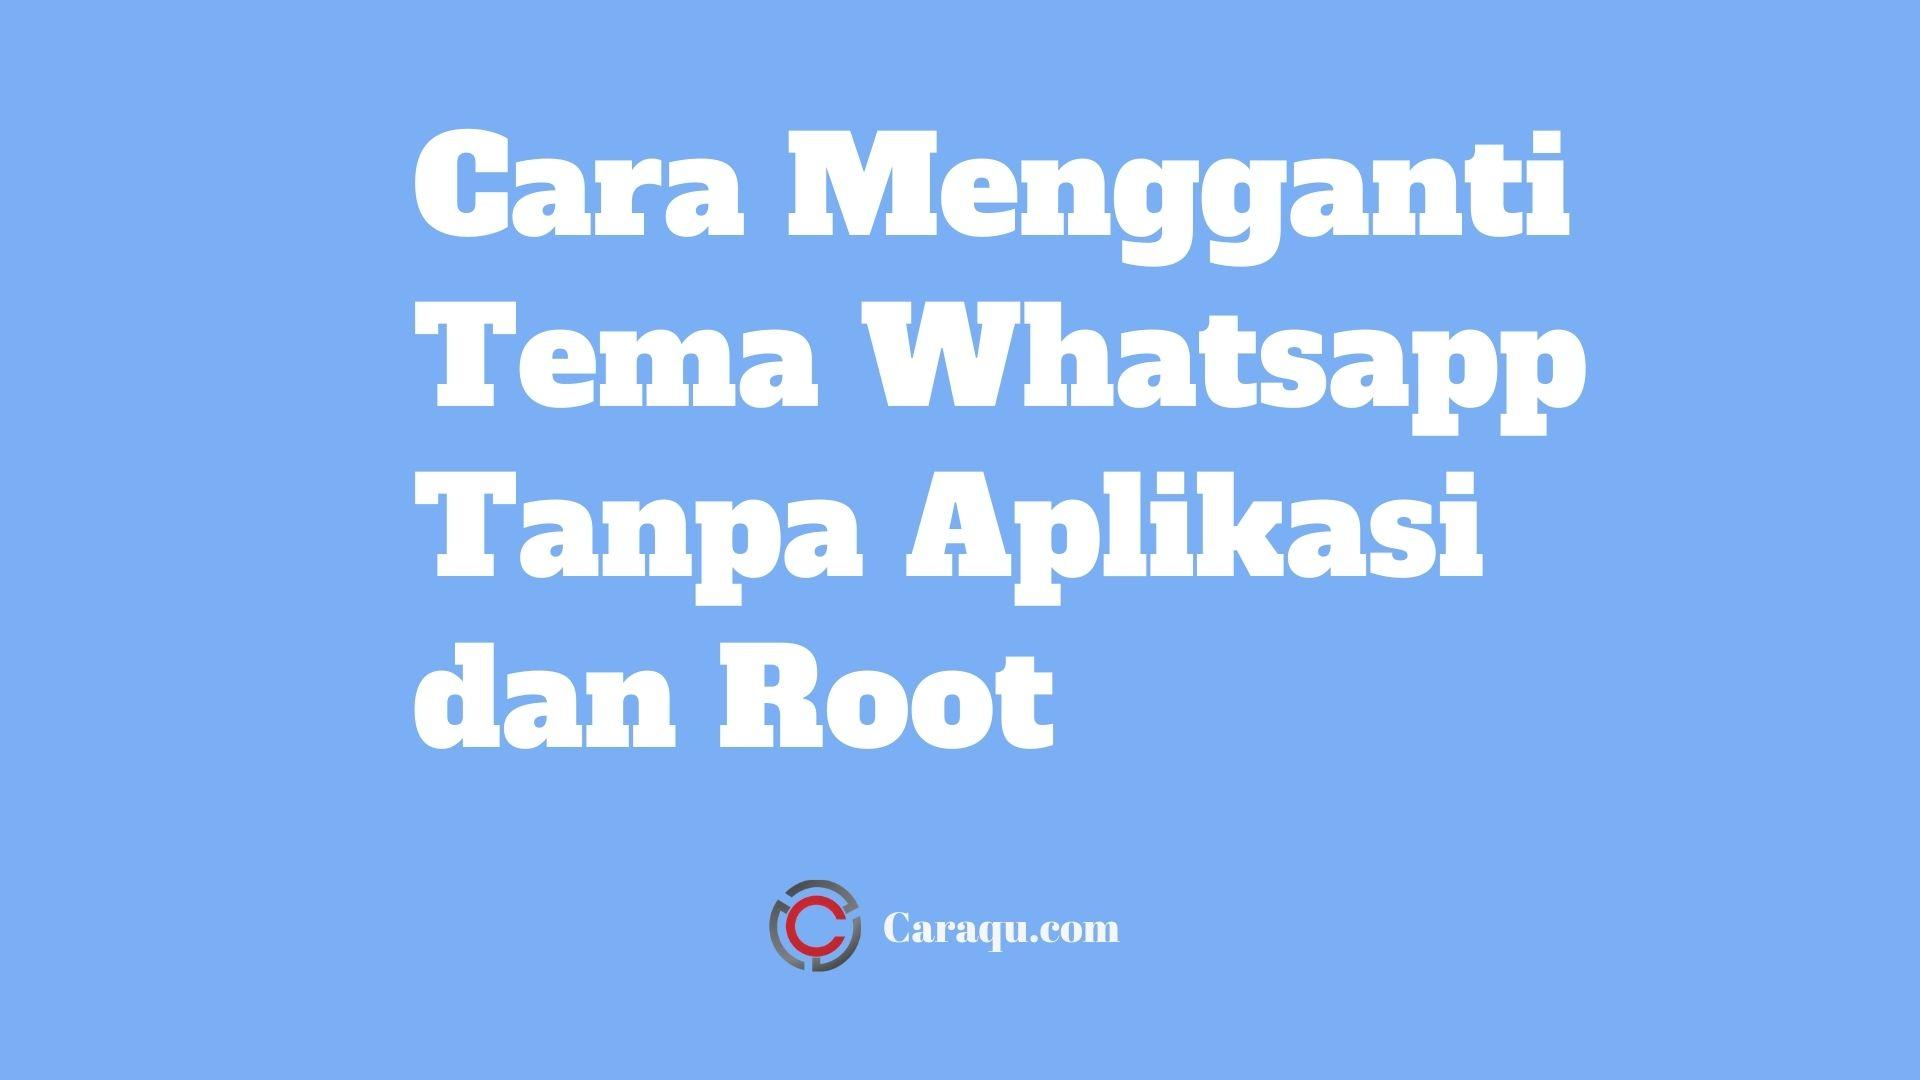 Cara Mengganti Tema Whatsapp Tanpa Aplikasi dan Root